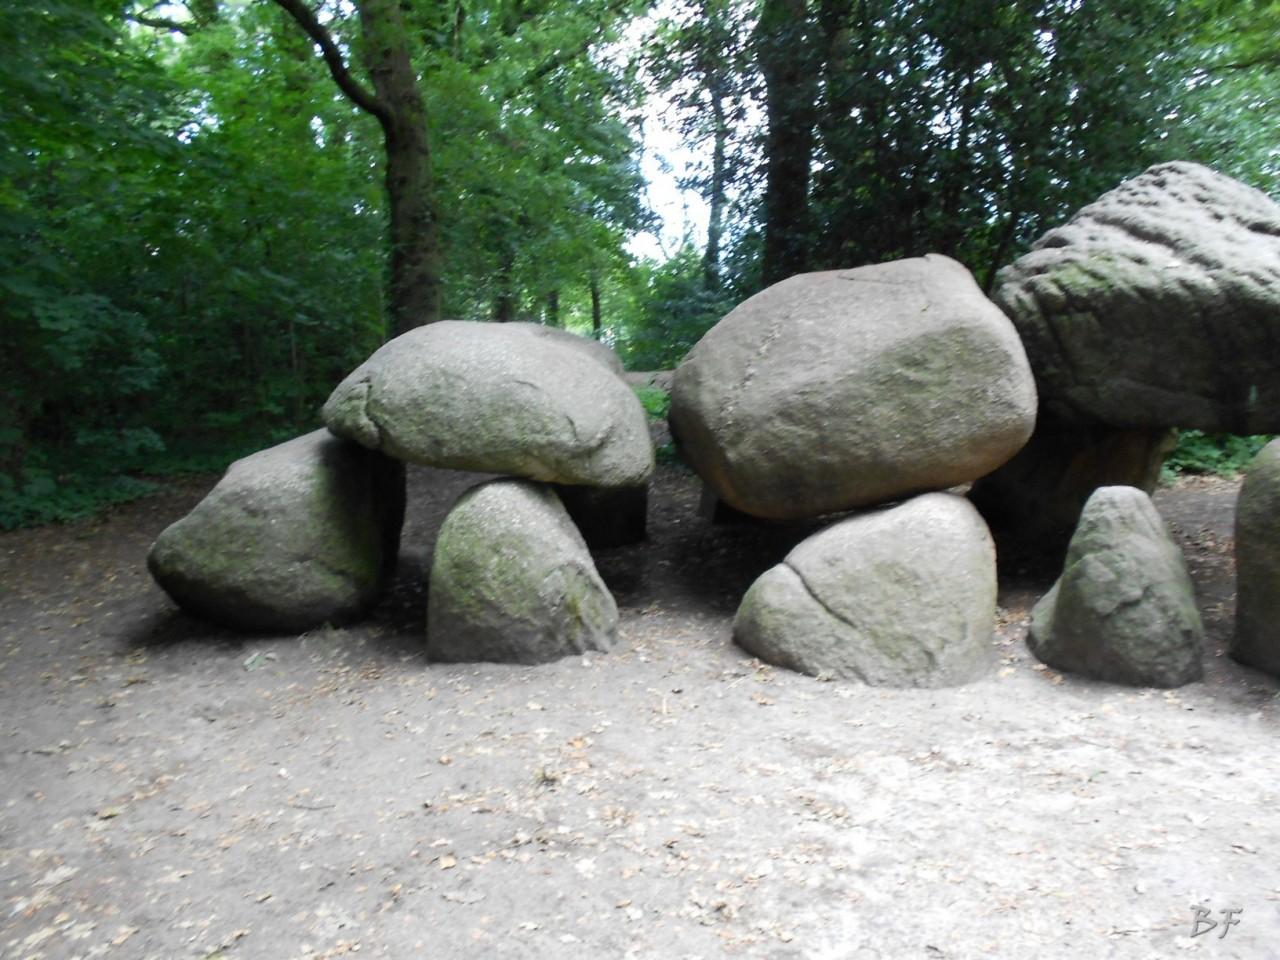 Hunebedden-Dolmen-Megaliti-Groeningen-Drenthe-Paesi-Bassi-68